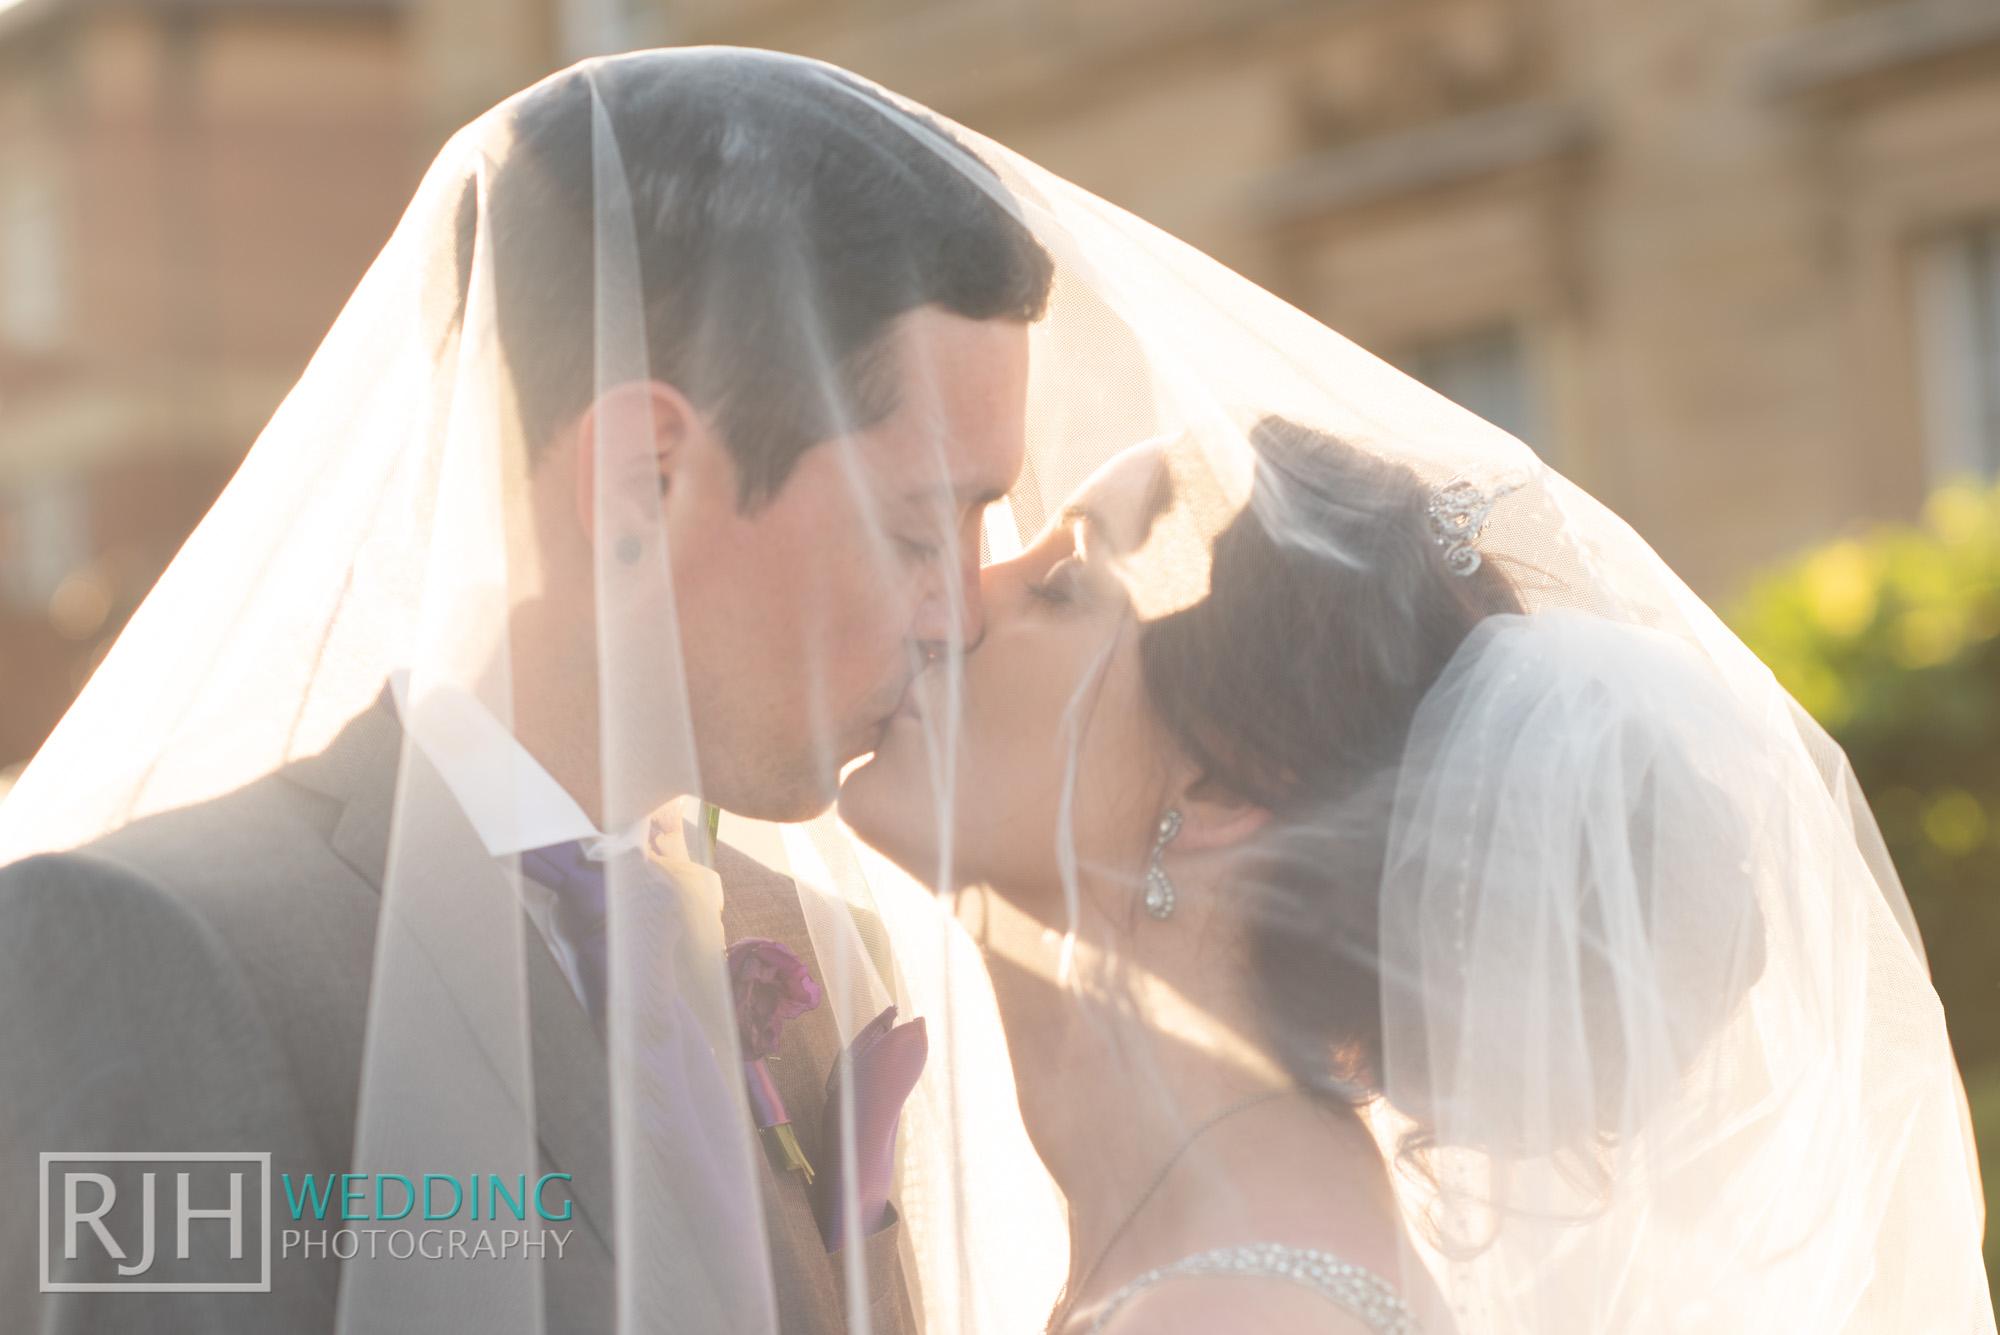 Oulton Hall Wedding Photography_Goodwill-Hall_044_DSC_3998.jpg